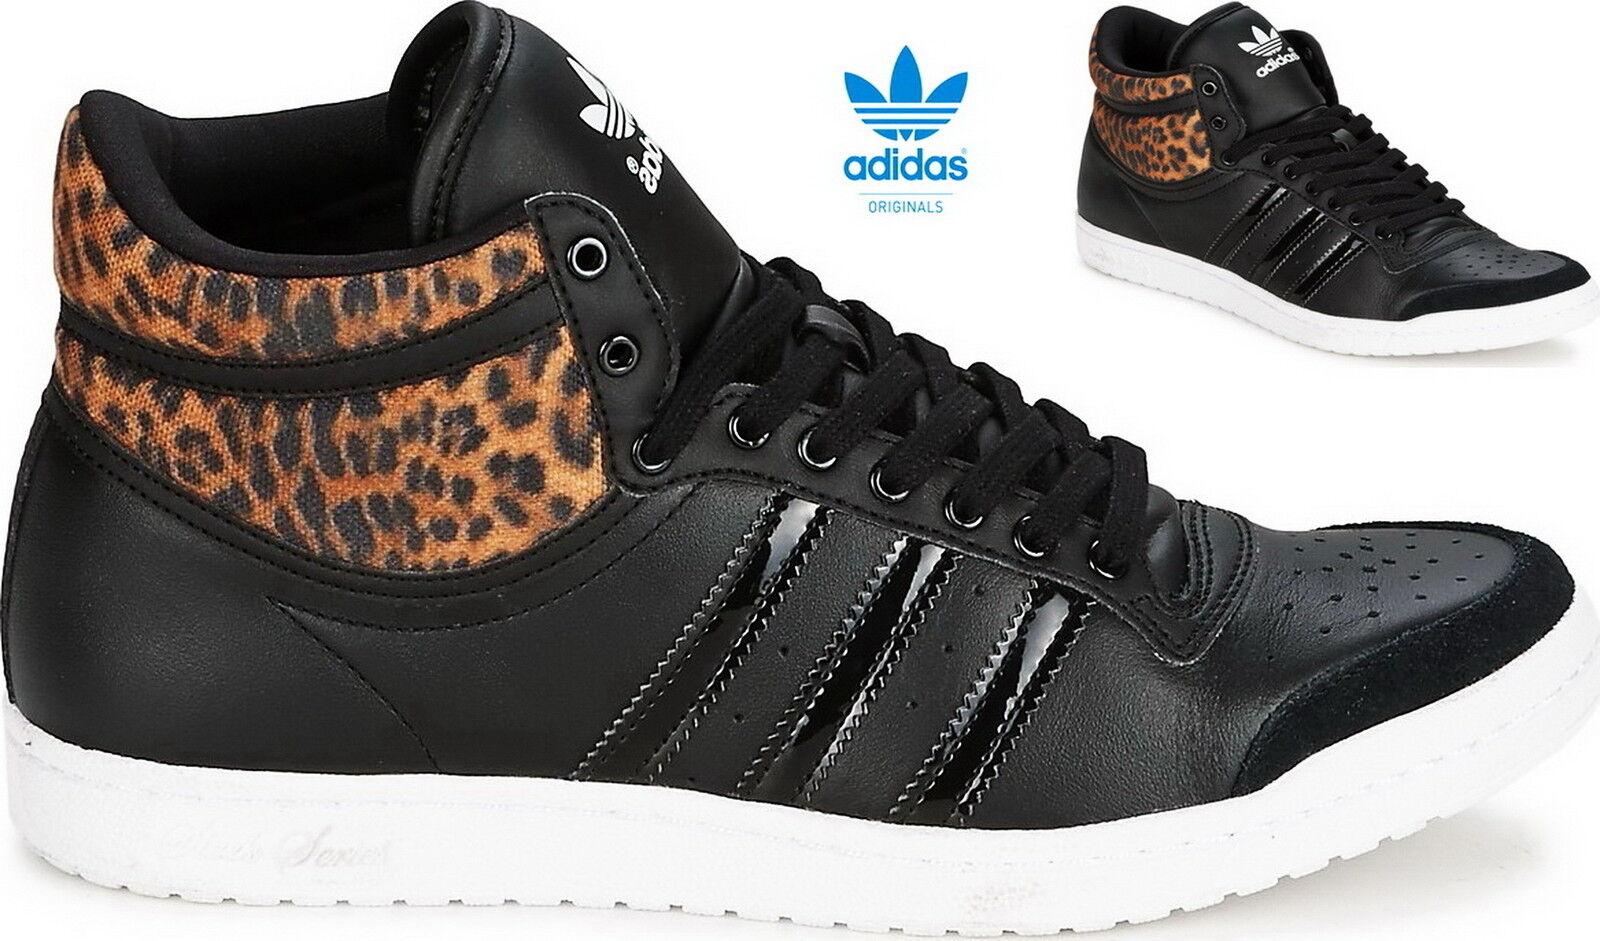 Adidas Top Ten Basket Hi Sleek W Basket Ten Femmes Noir Leopard m20835 2e765e